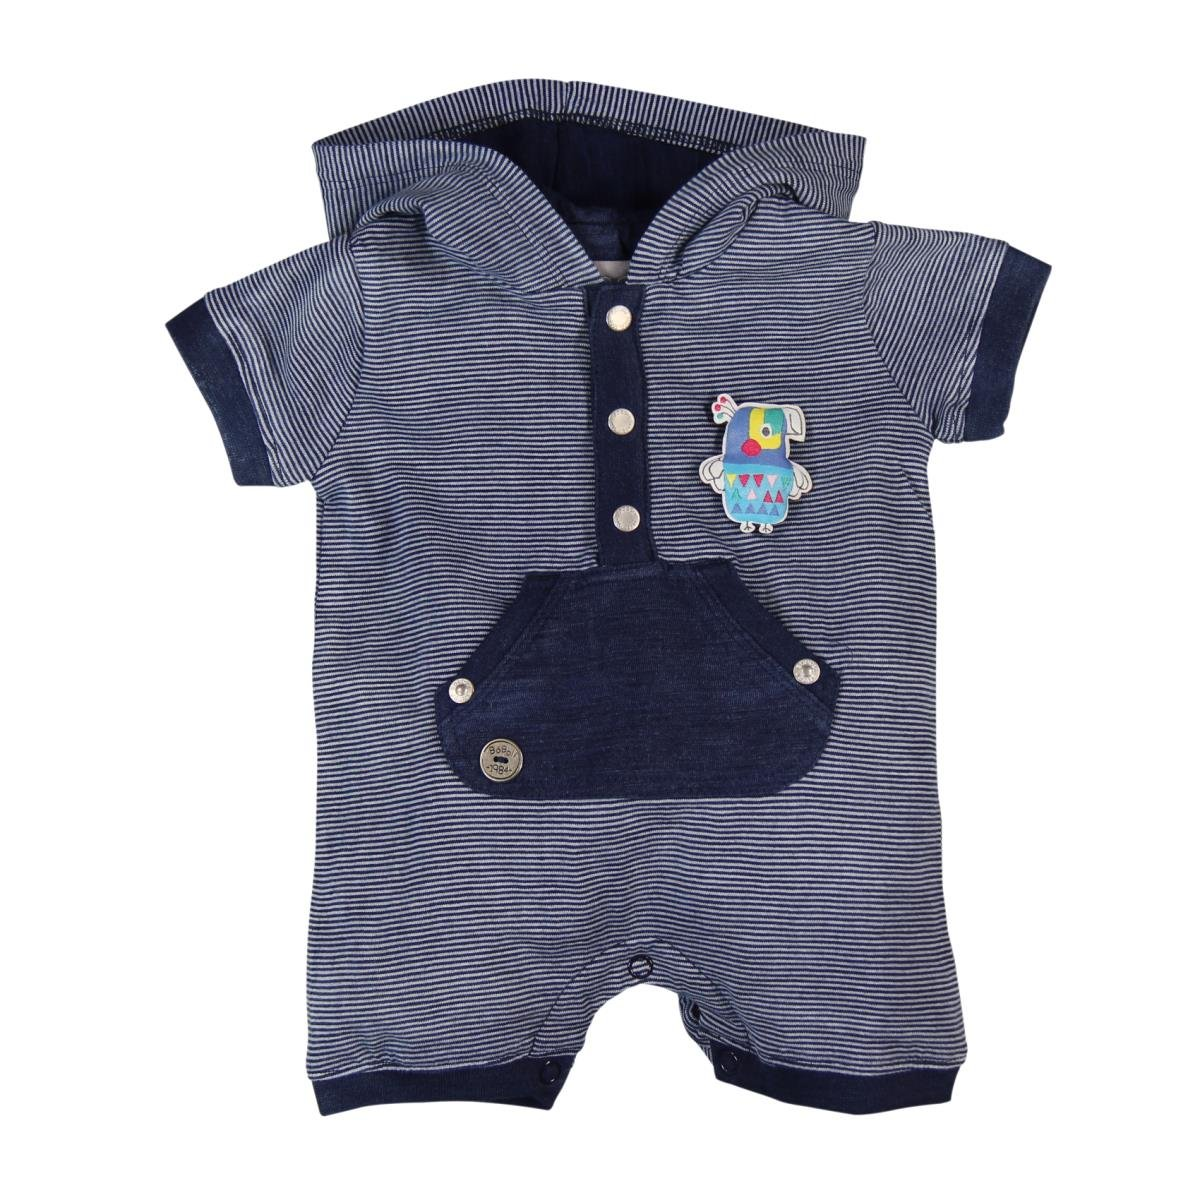 boboli Knit Play Suit For Baby, Mono para Bebés Bóboli